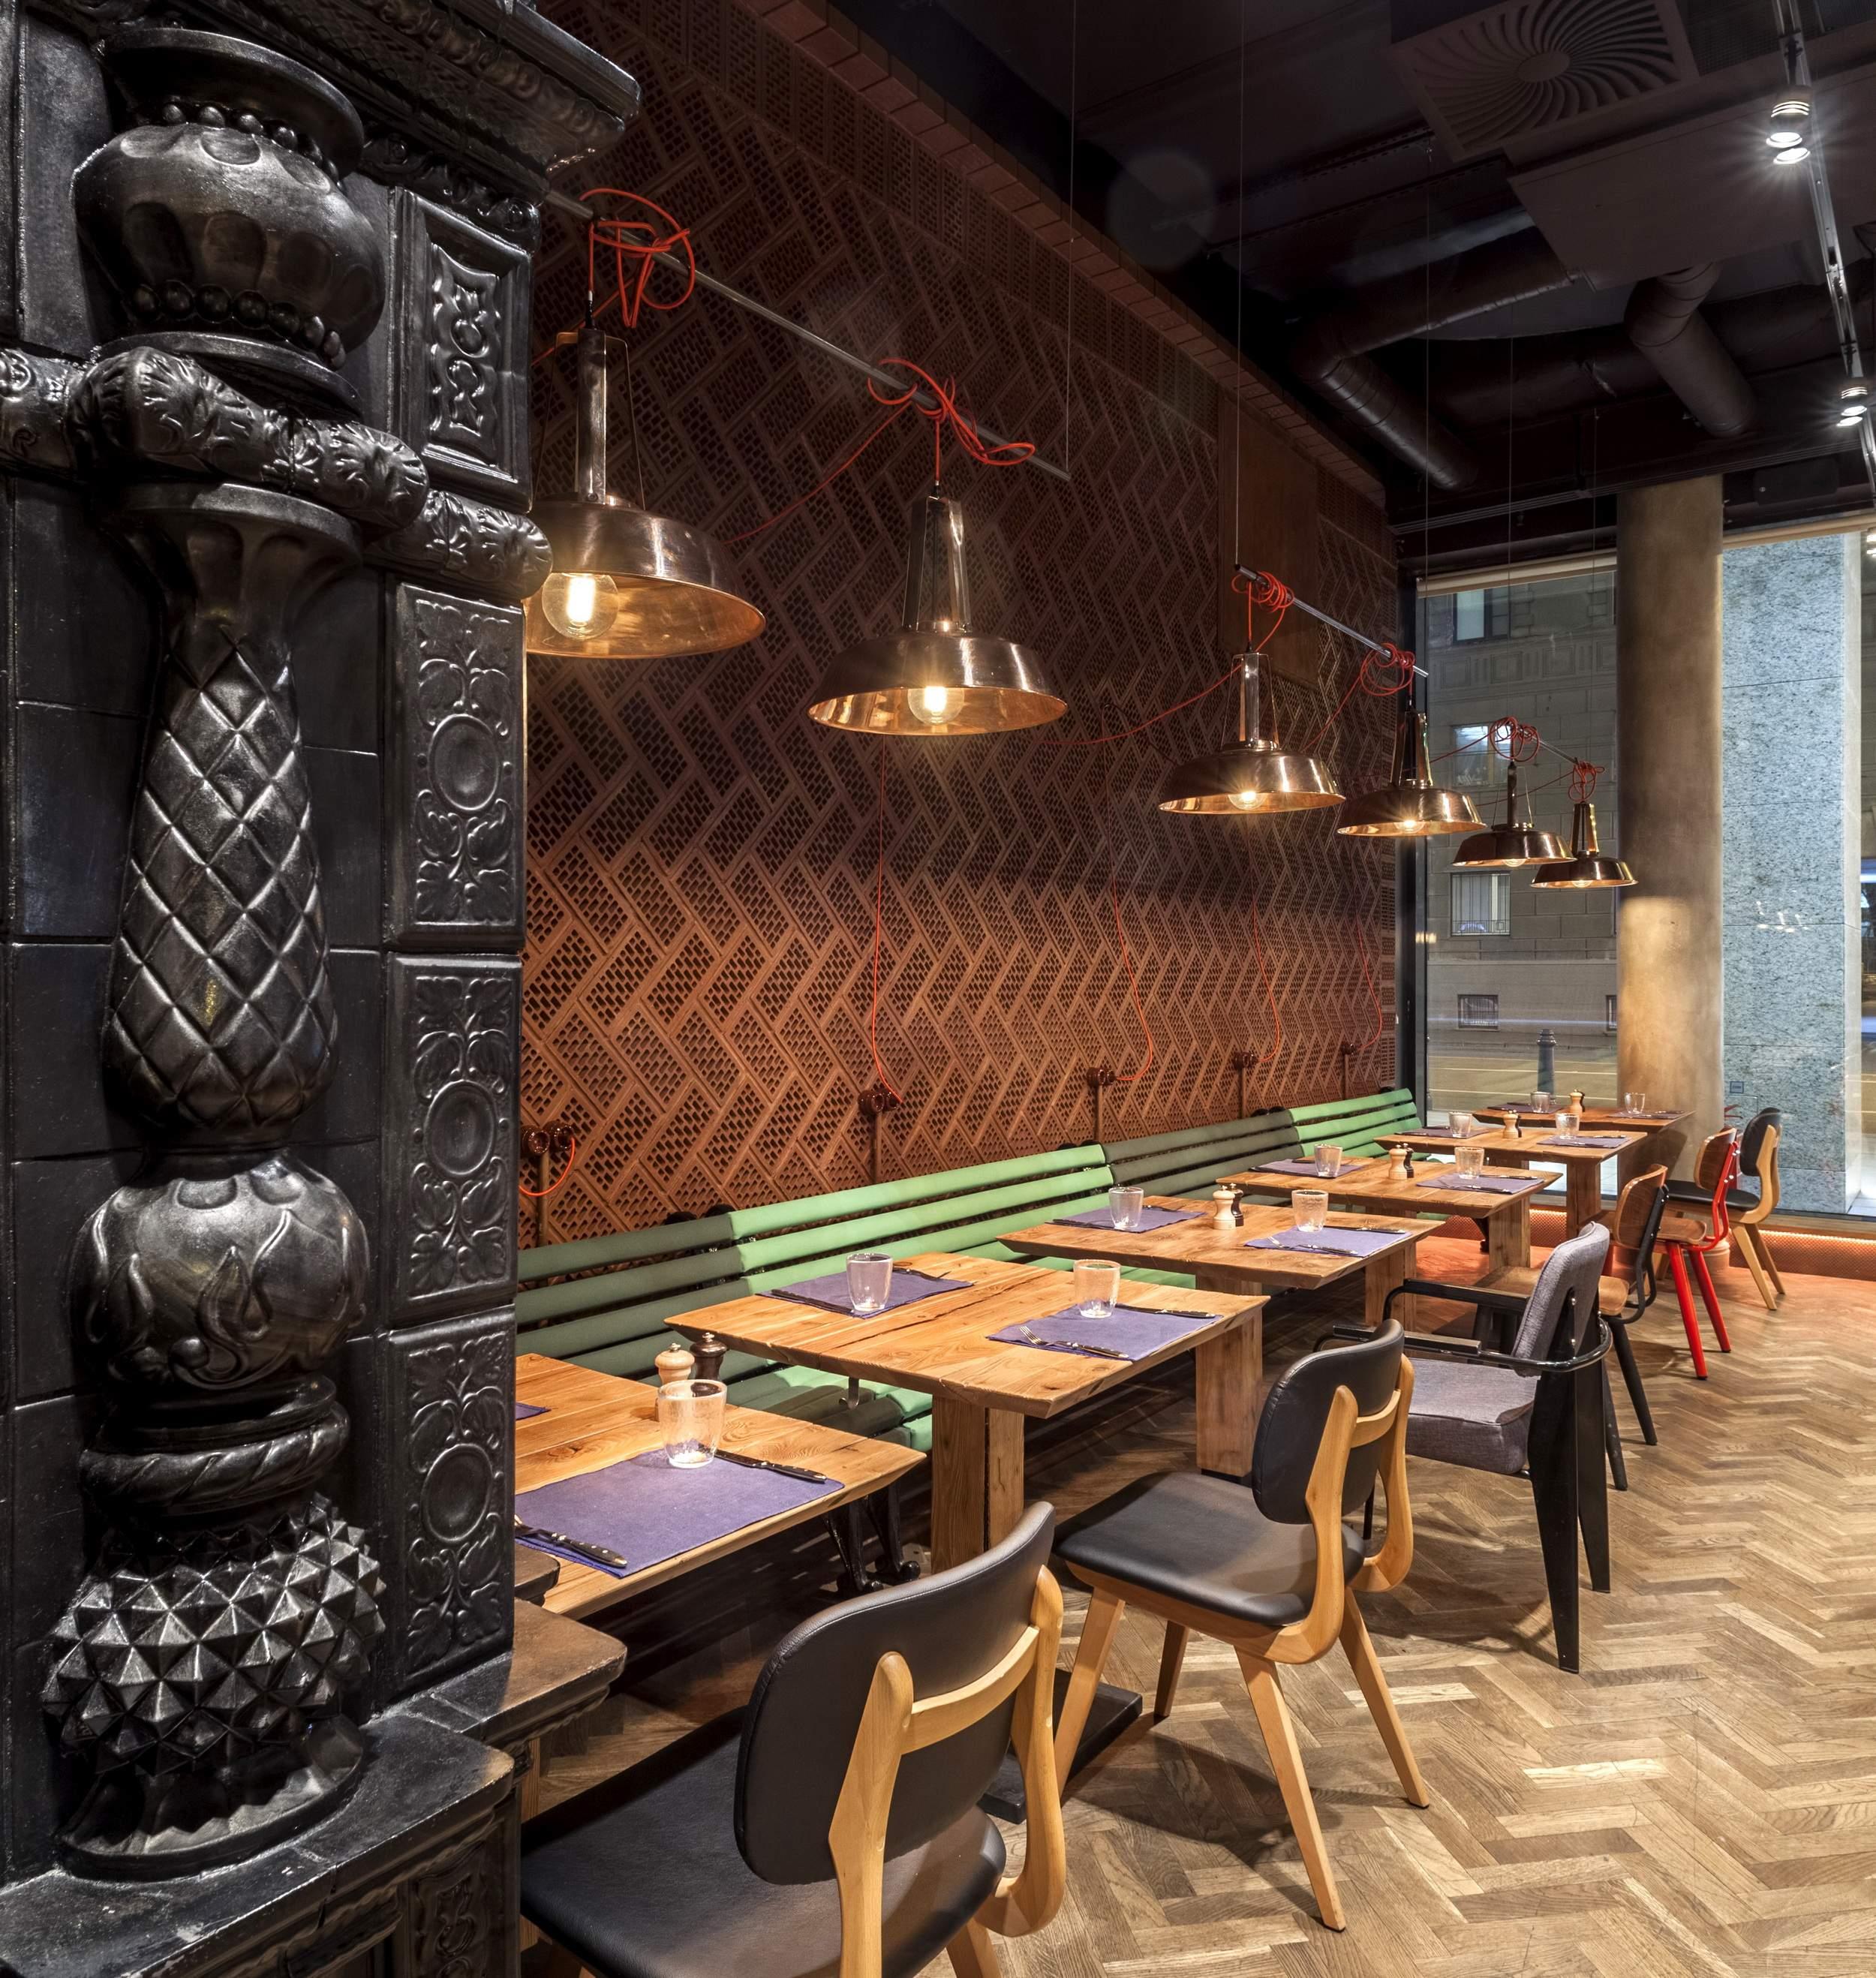 Ресторан «Adri BBQ Wine Restaurant» в Москве, Россия